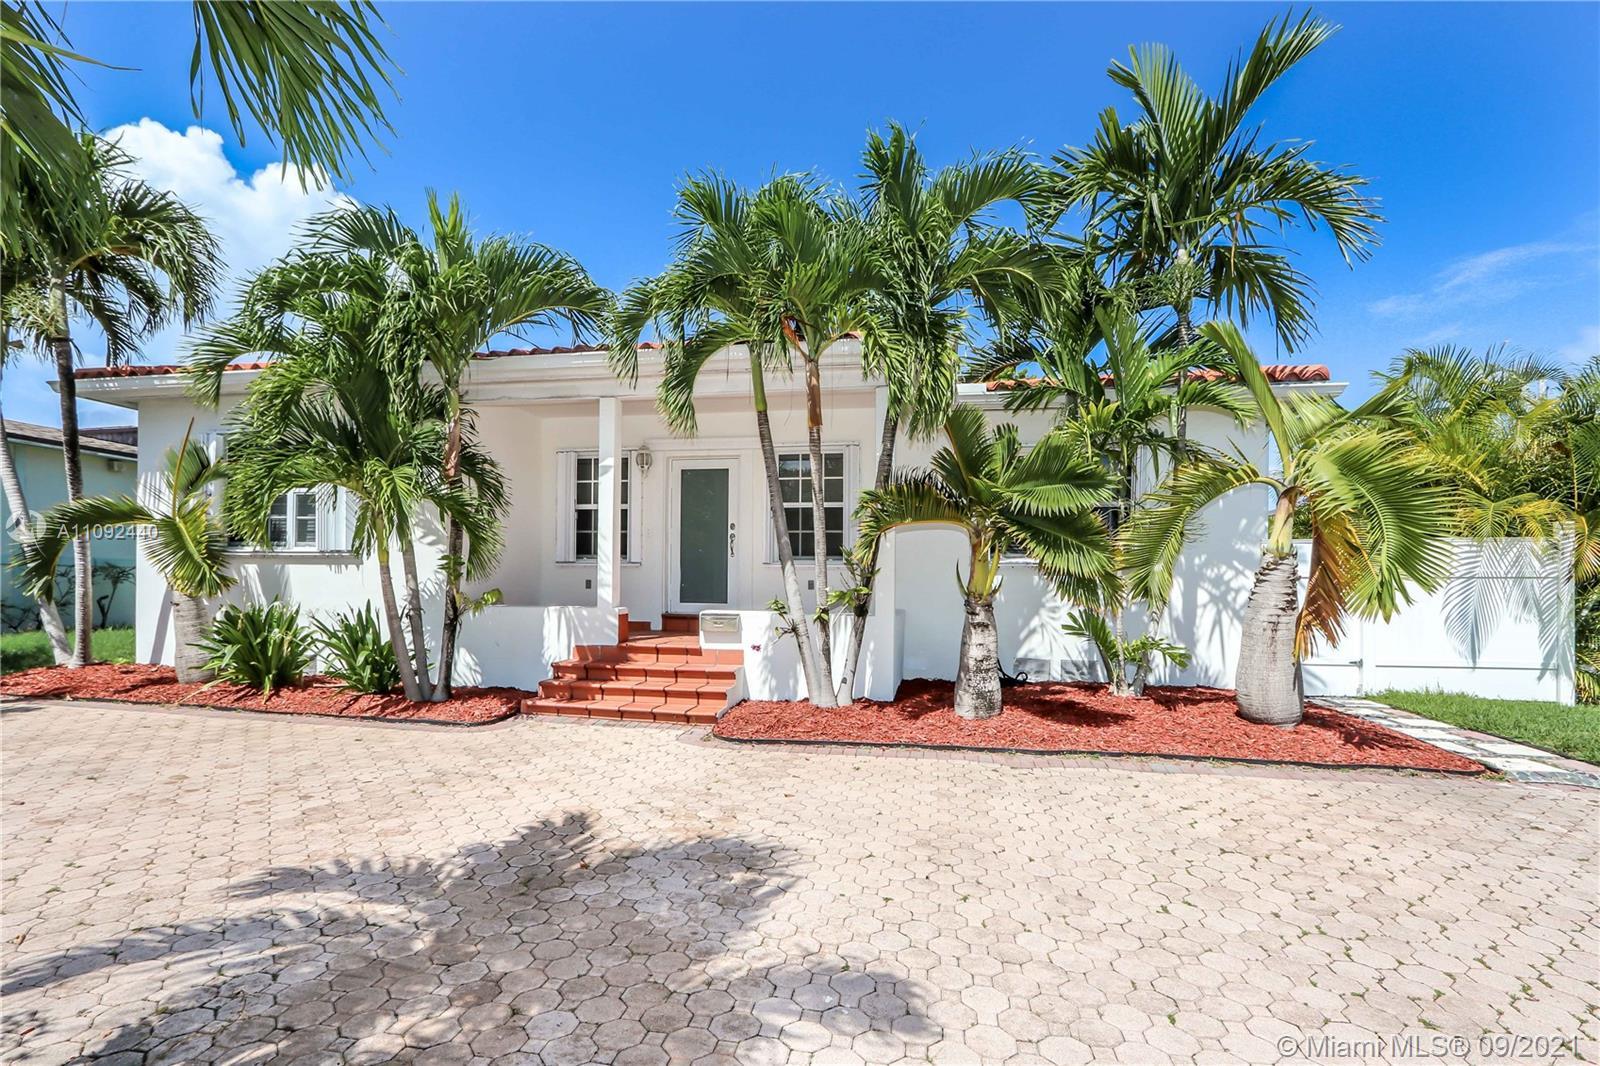 8020 Noremac Ave, Miami Beach, Florida 33141